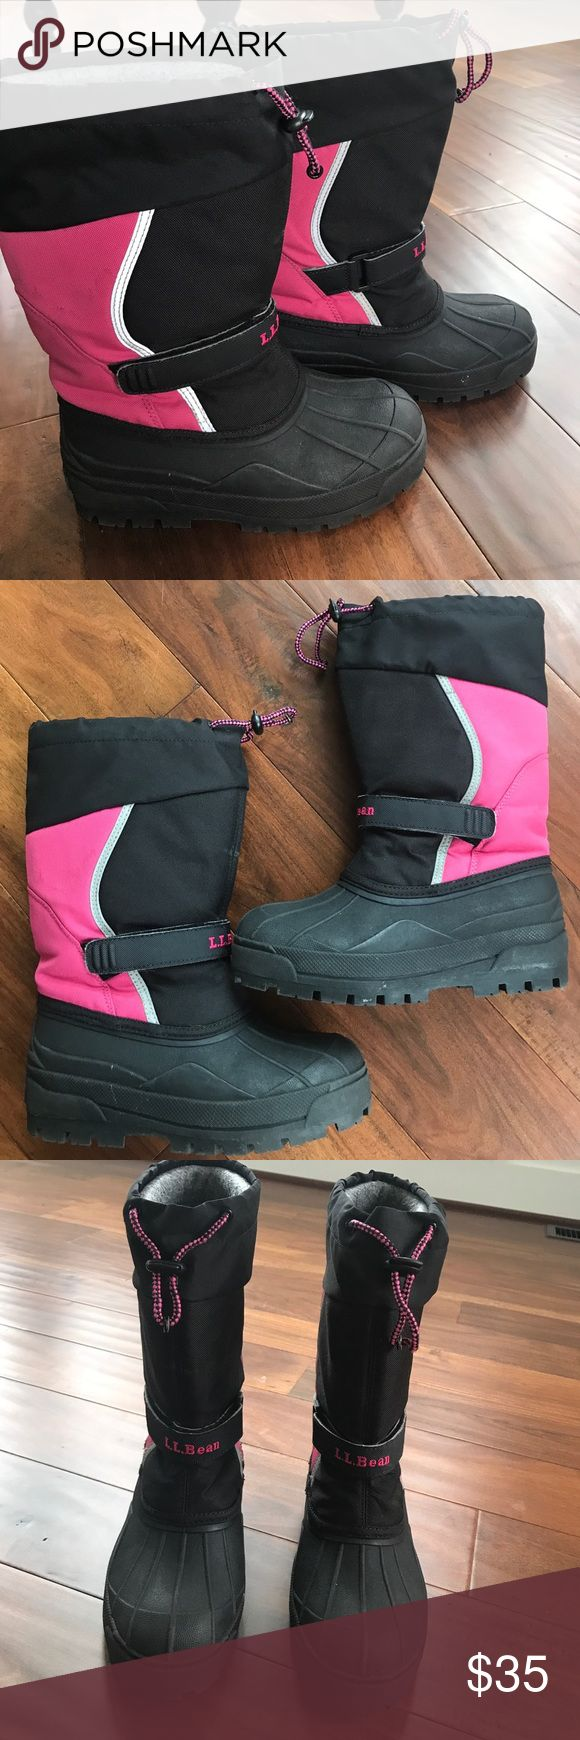 L l bean order form - Ll Bean Winter Boots Size 4